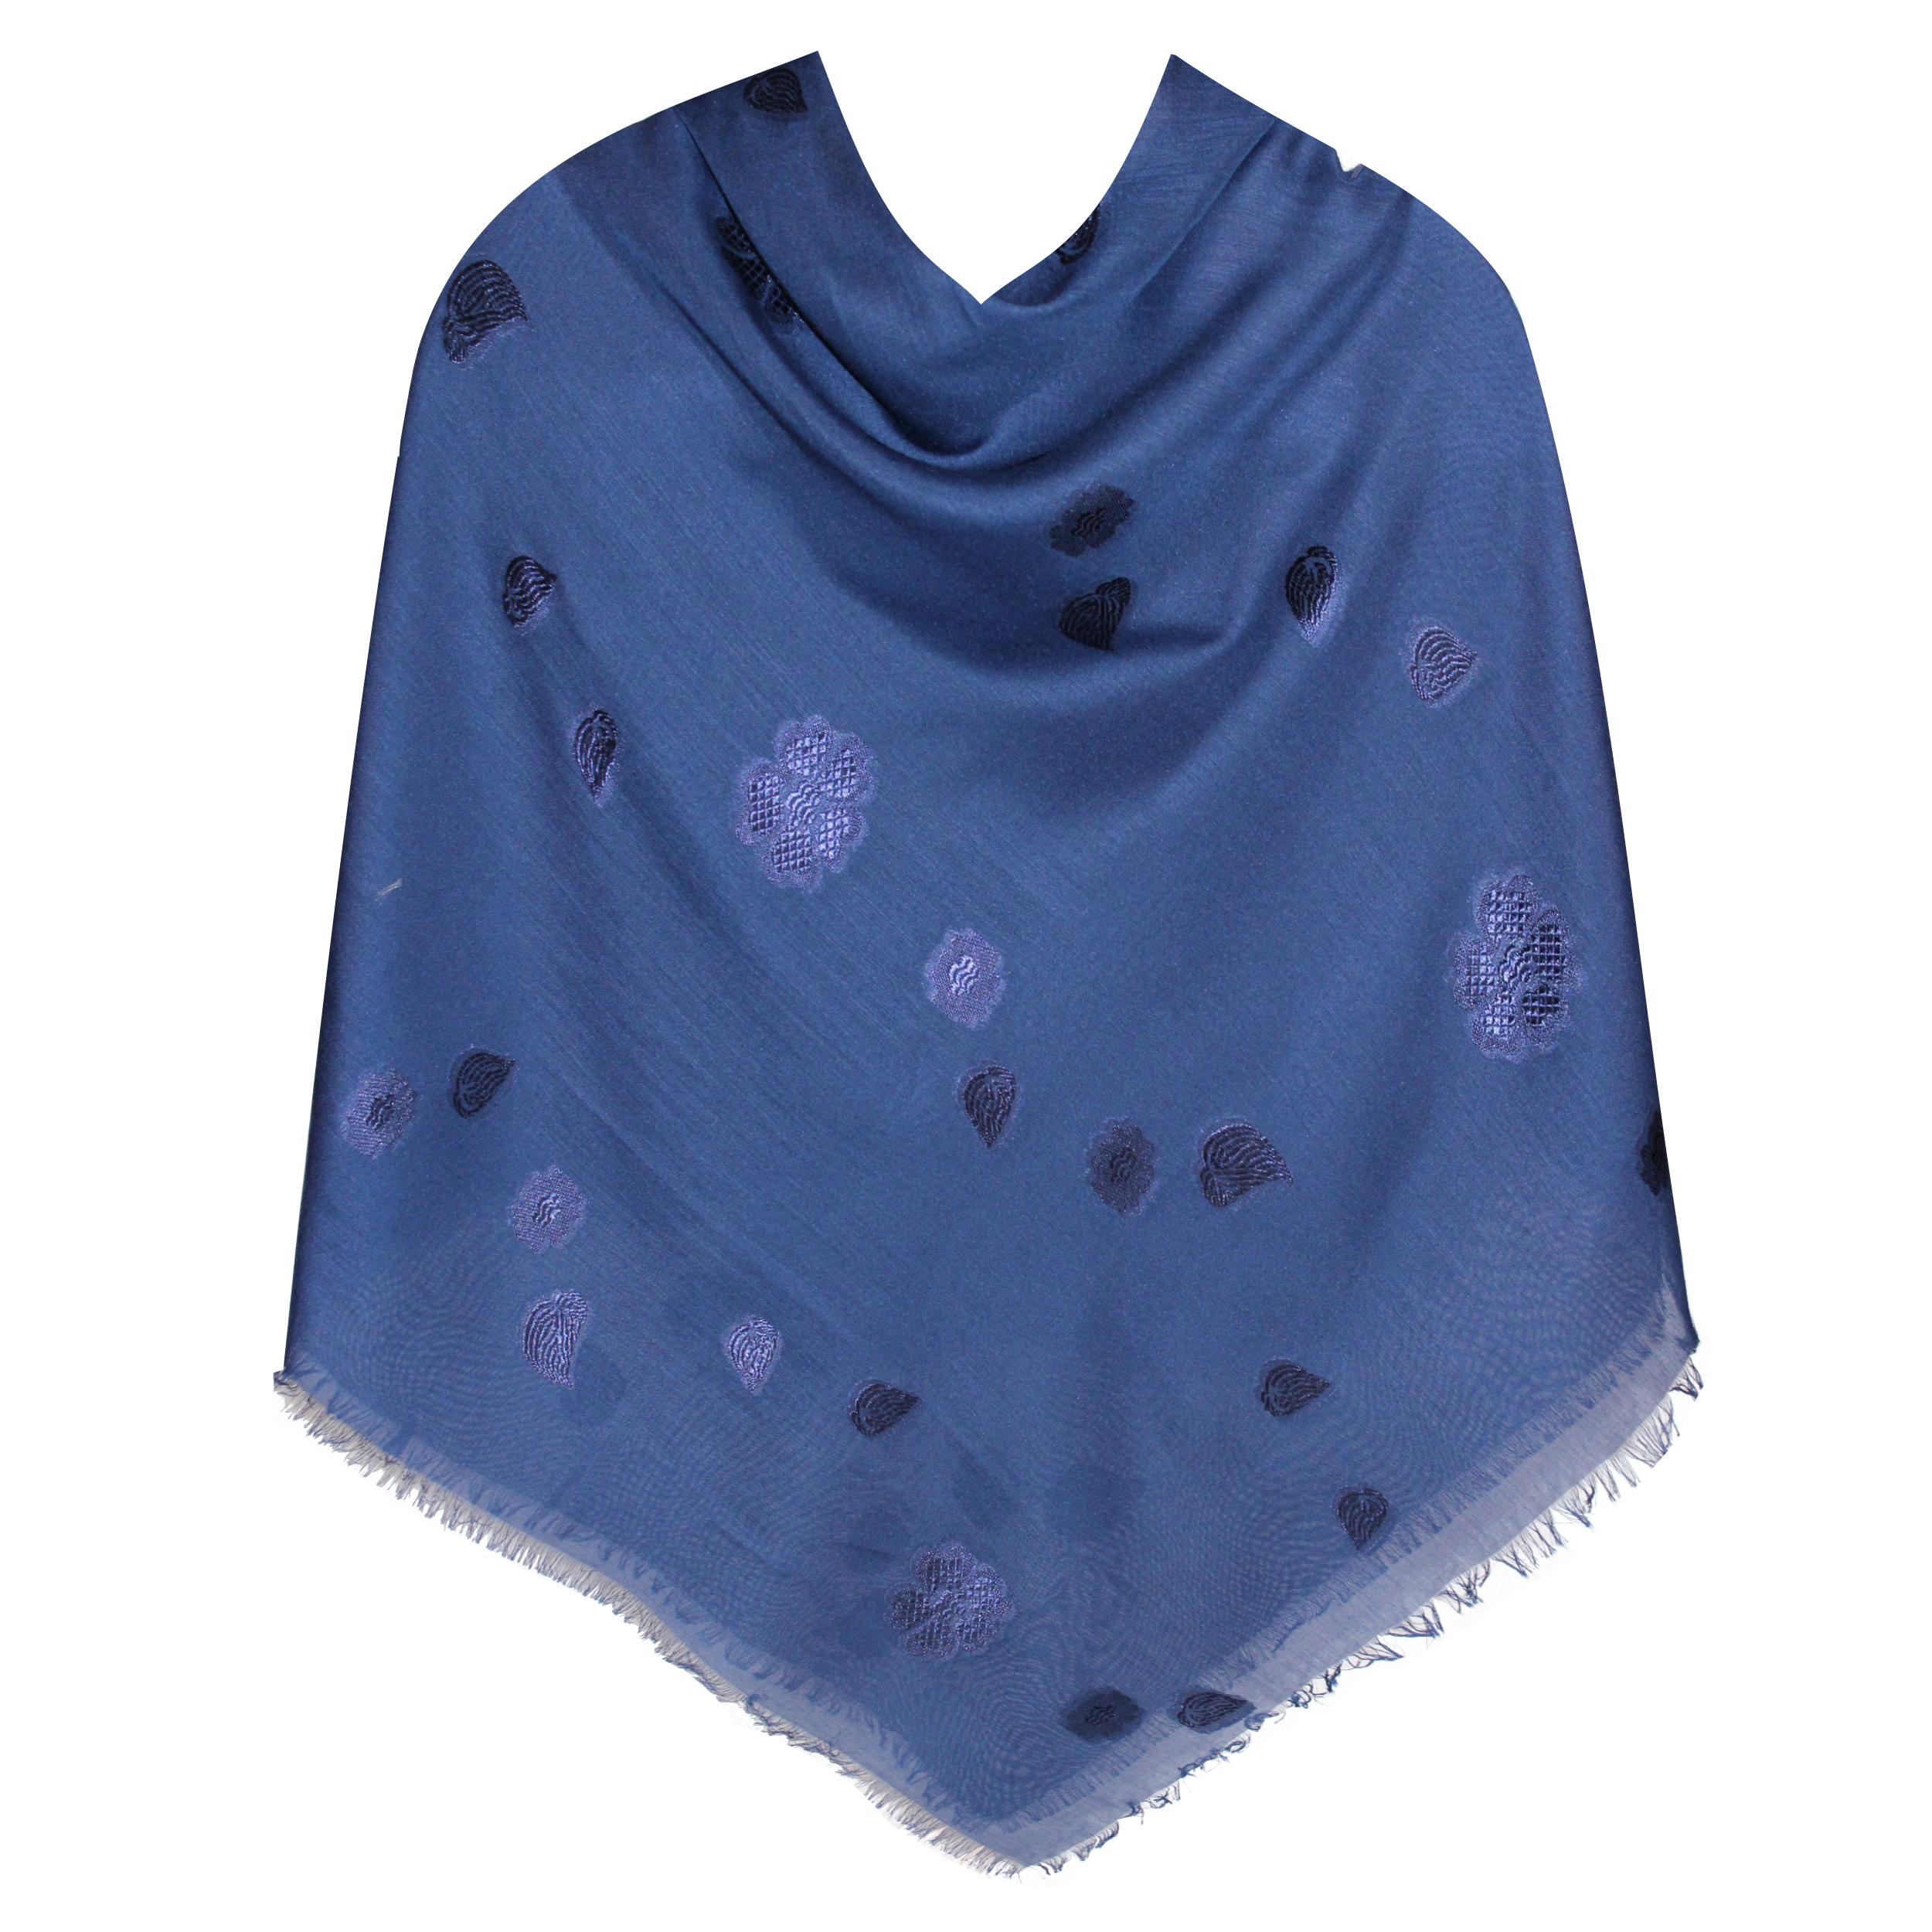 روسری زنانه کد 0074